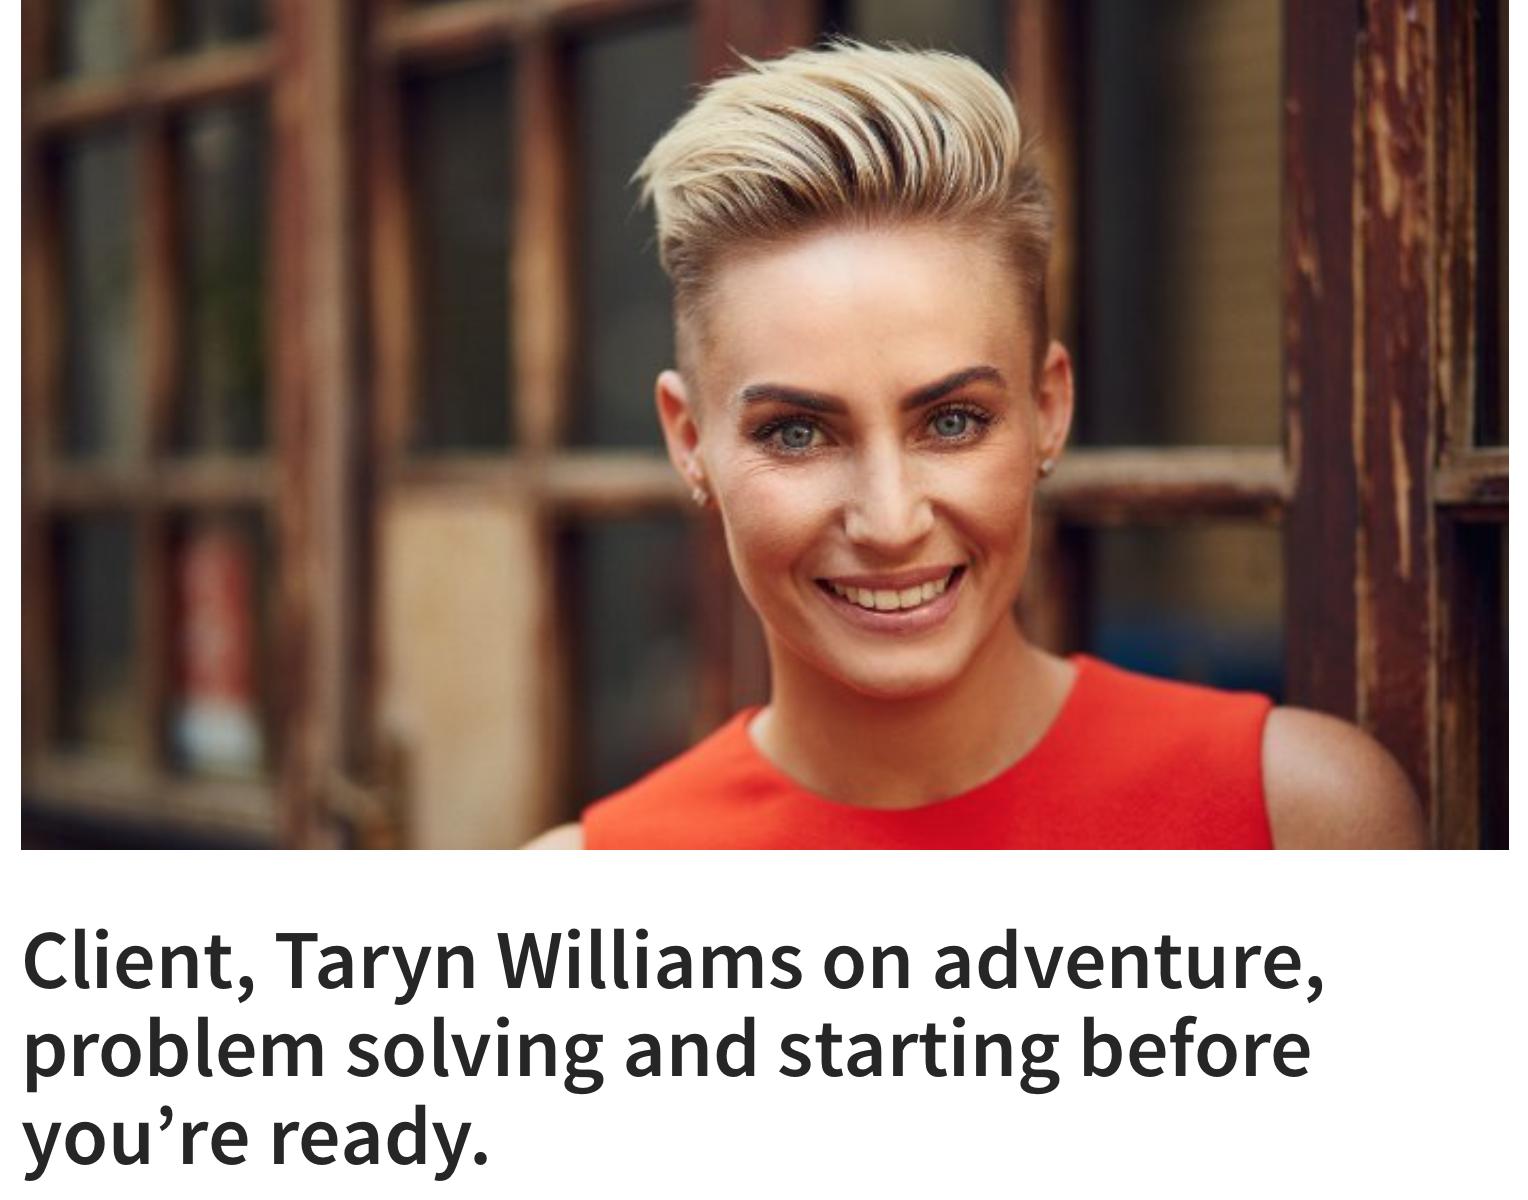 https://www.linkedin.com/pulse/client-taryn-williams-adventure-problem-solving-starting-dybac